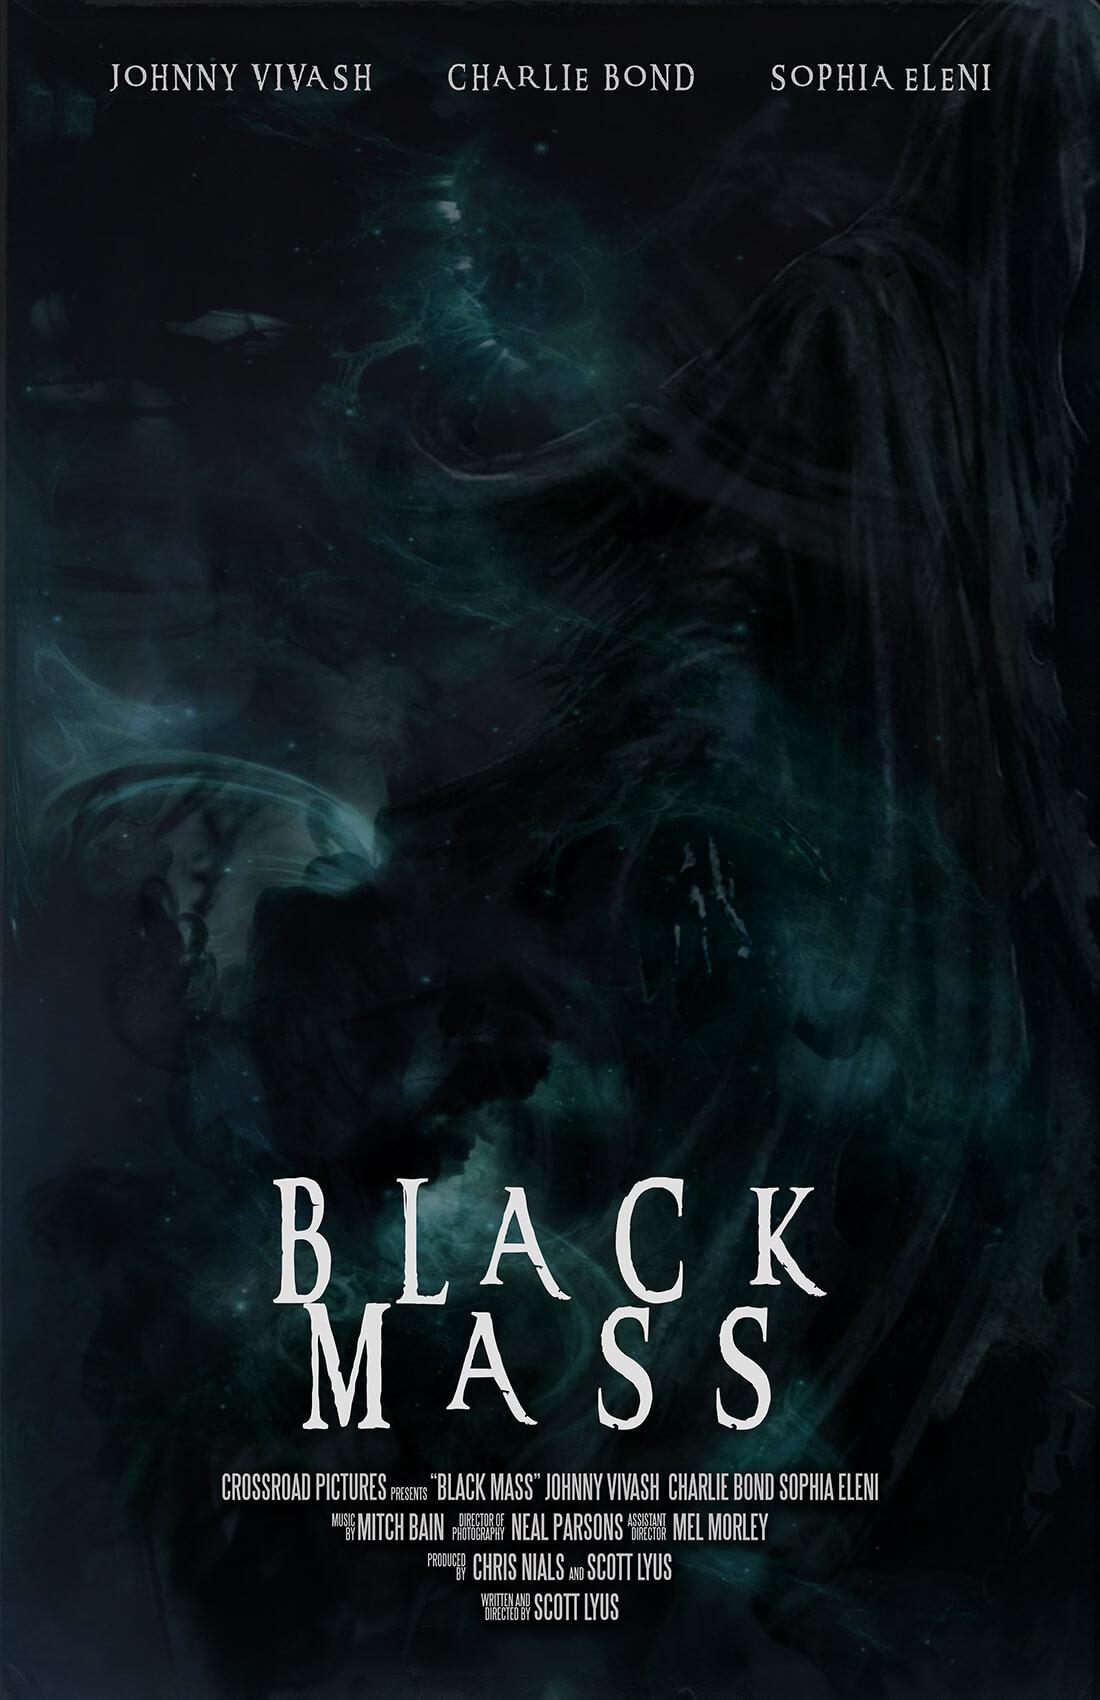 BLACK MASS Gets off to a Flying Start on Kickstarter - STARBURST